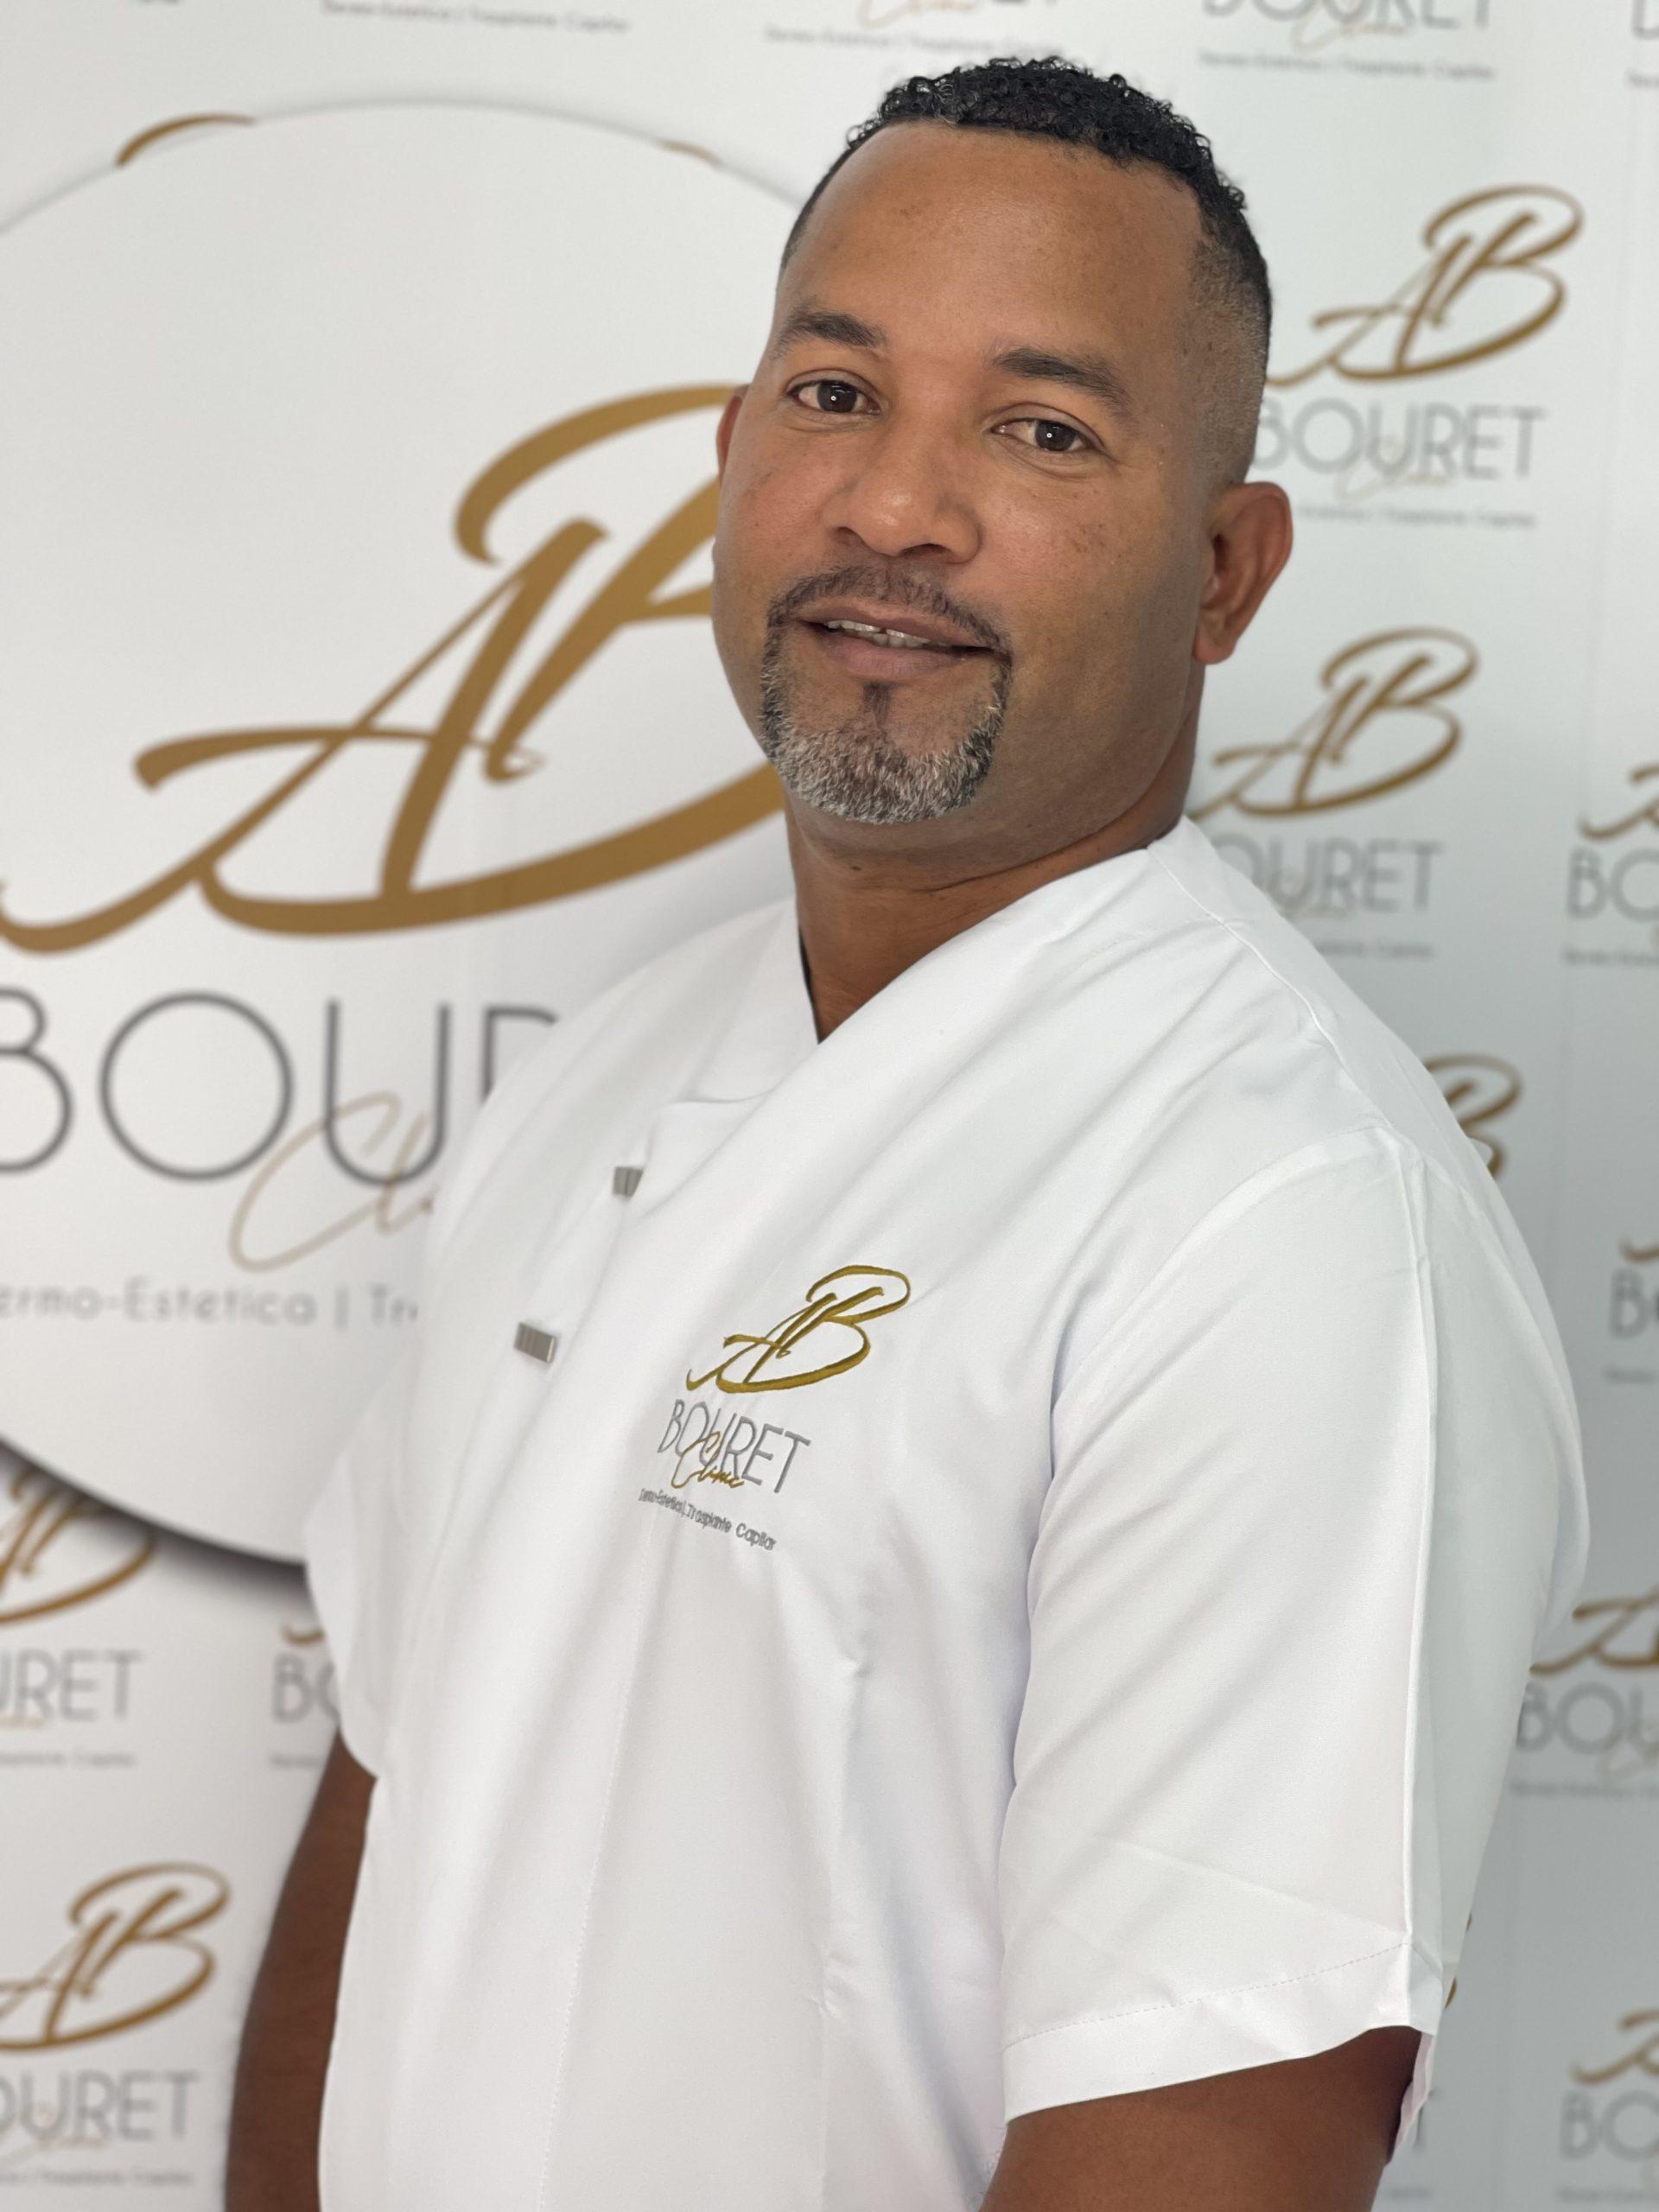 Victor - Bouret Clinic